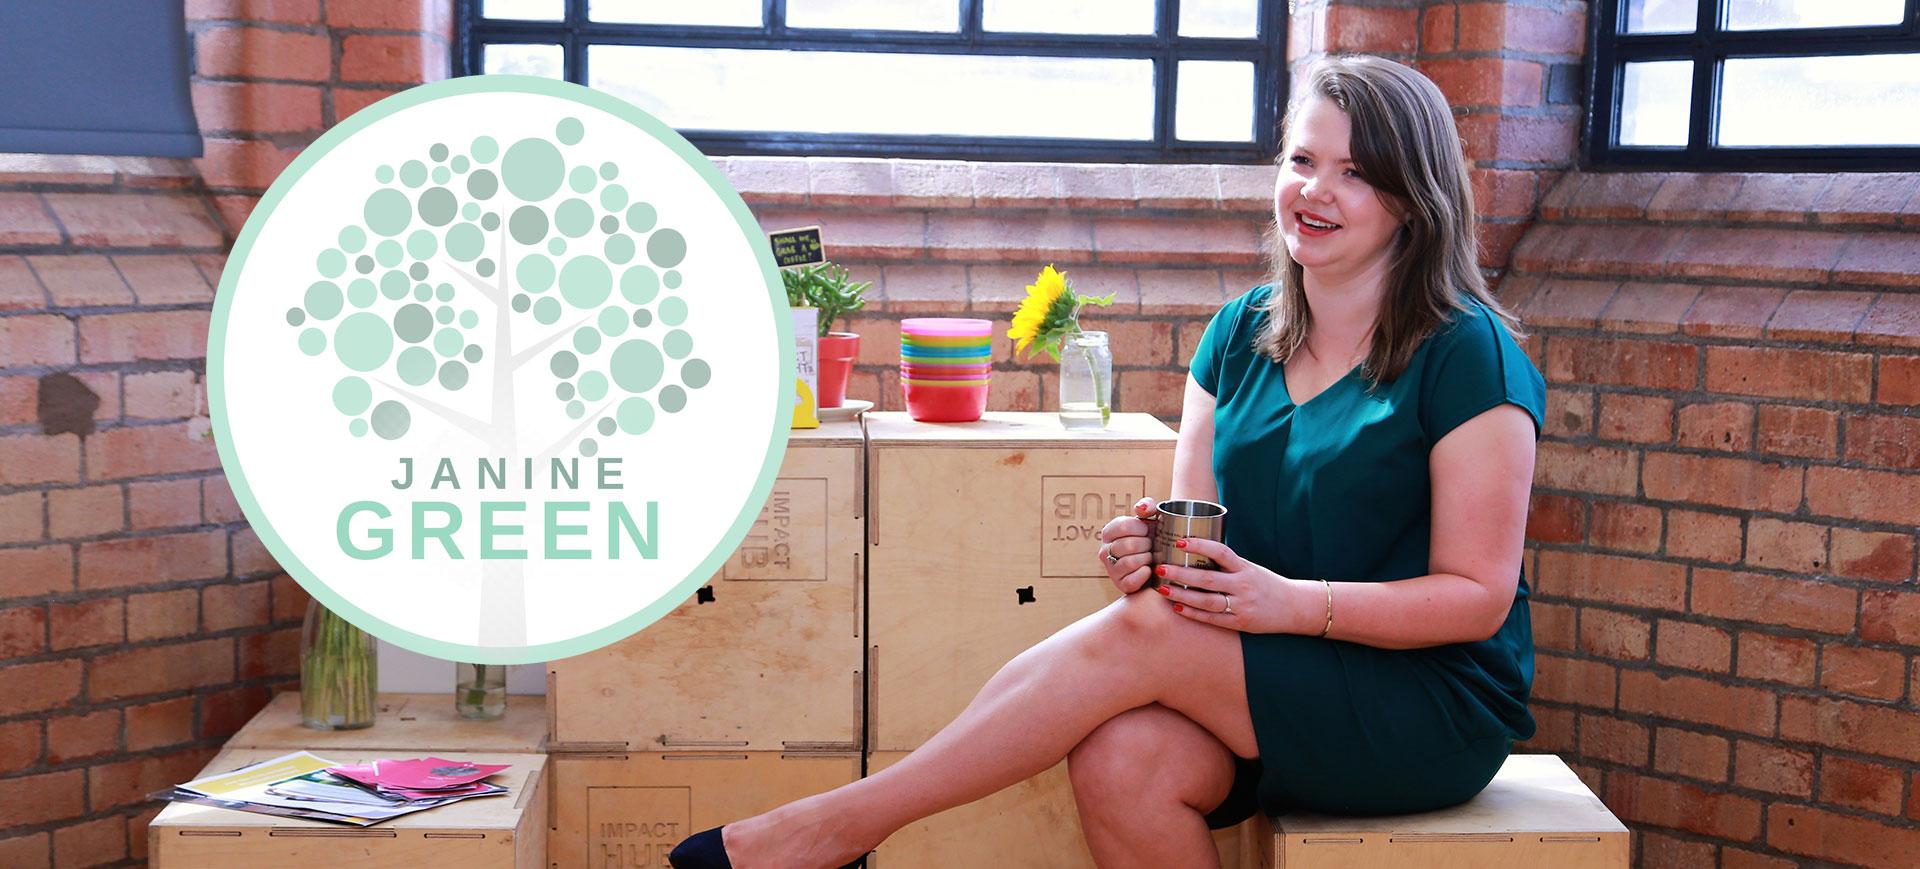 Janine Green ASB